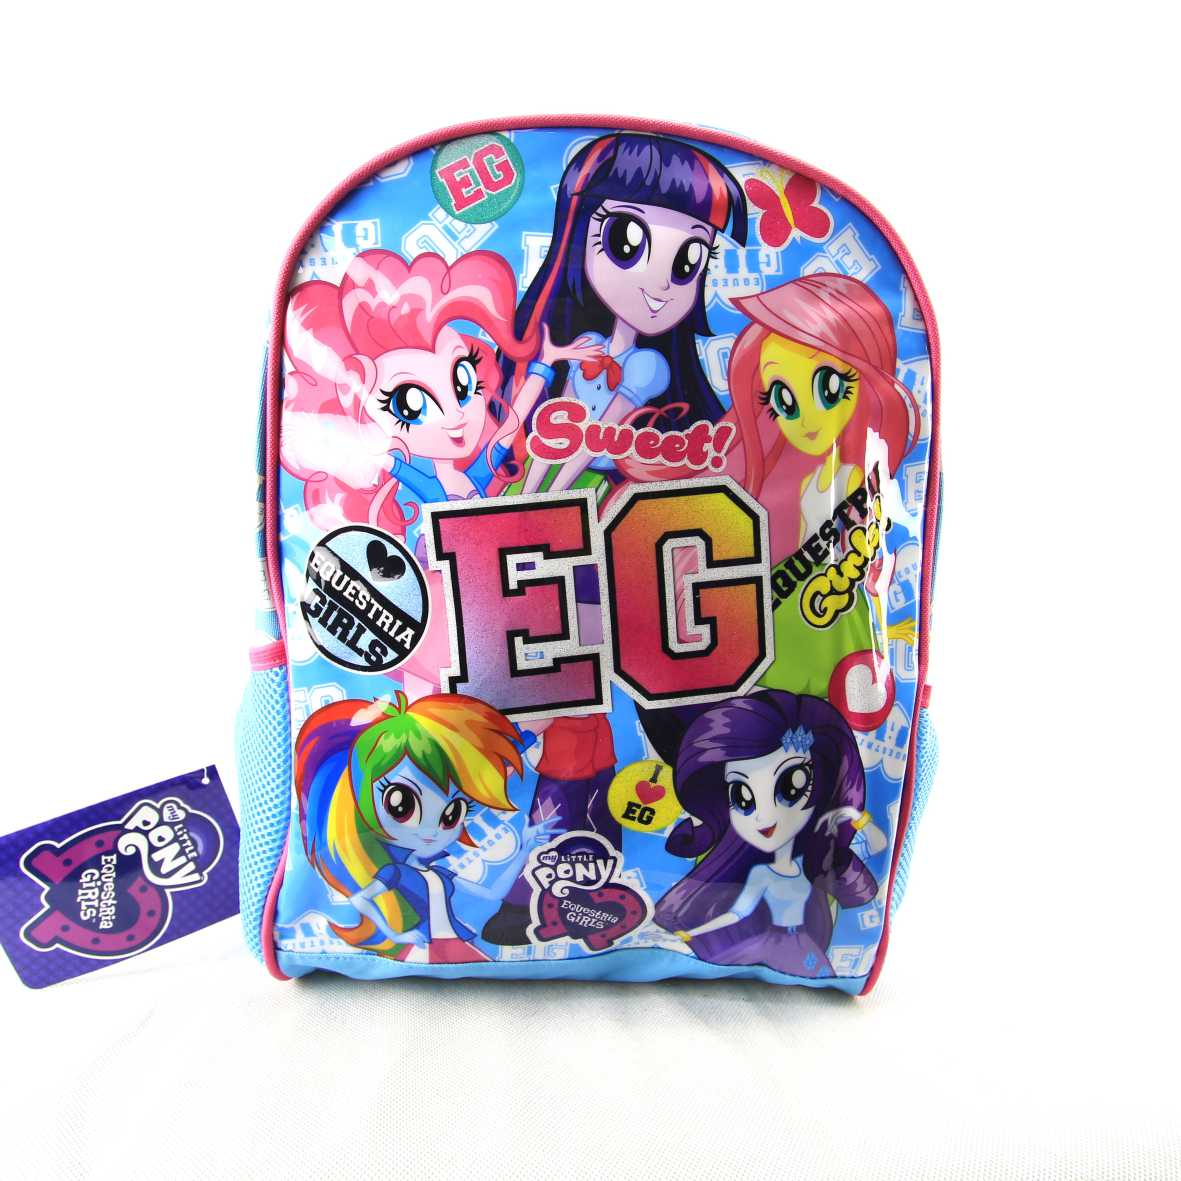 Mochila Equestria Girls My Little Pony DMW Bags 48998